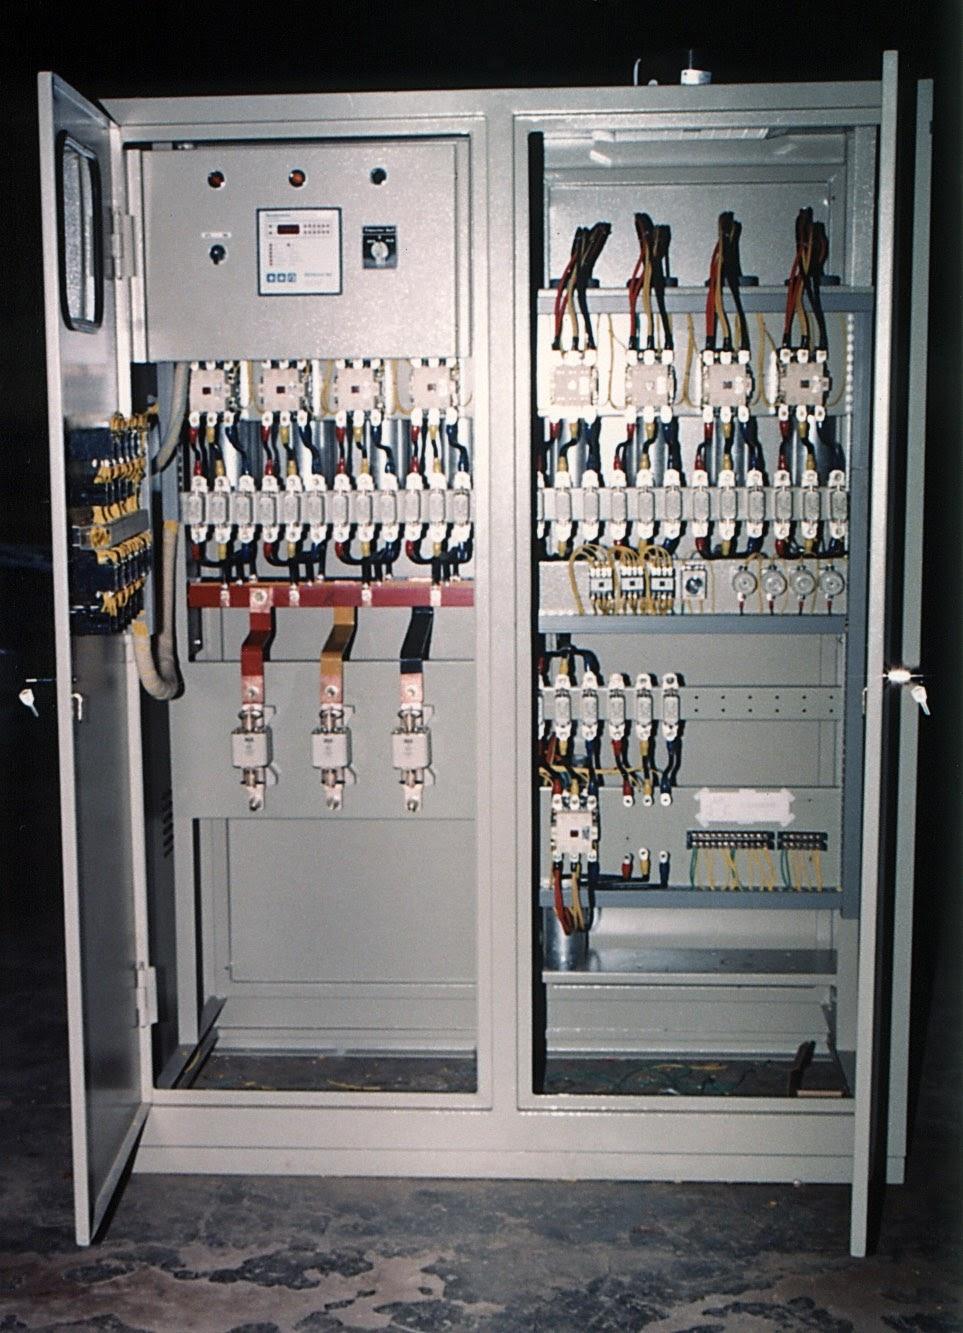 Gogeneration fungsi spesifikasi beban dan komponen panel konstruksi panel distribusi ccuart Choice Image